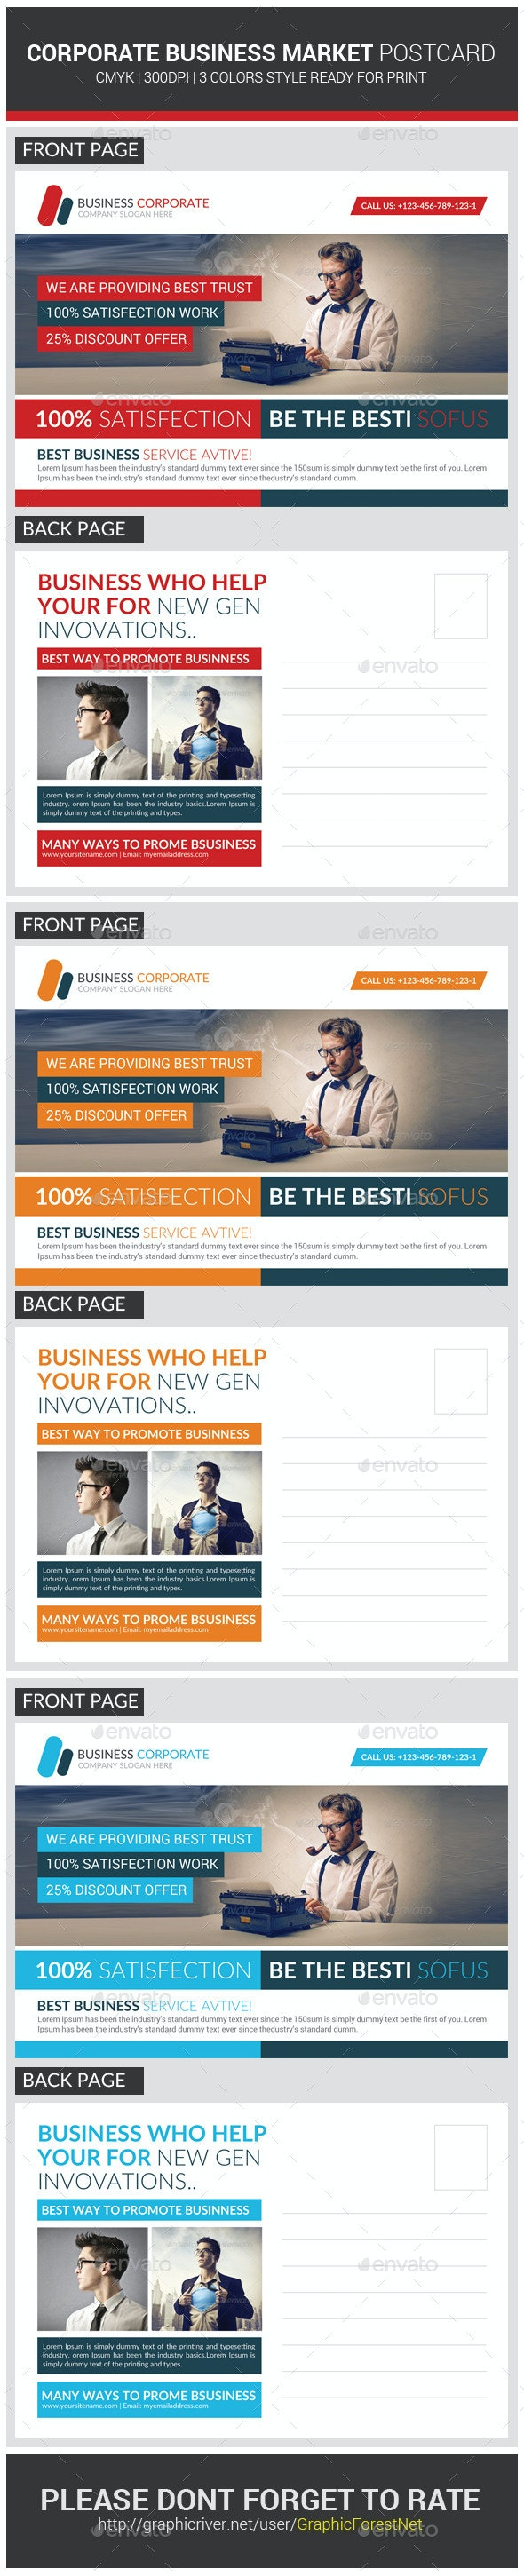 Marketing Corporate Business Postcard Template - Cards & Invites Print Templates